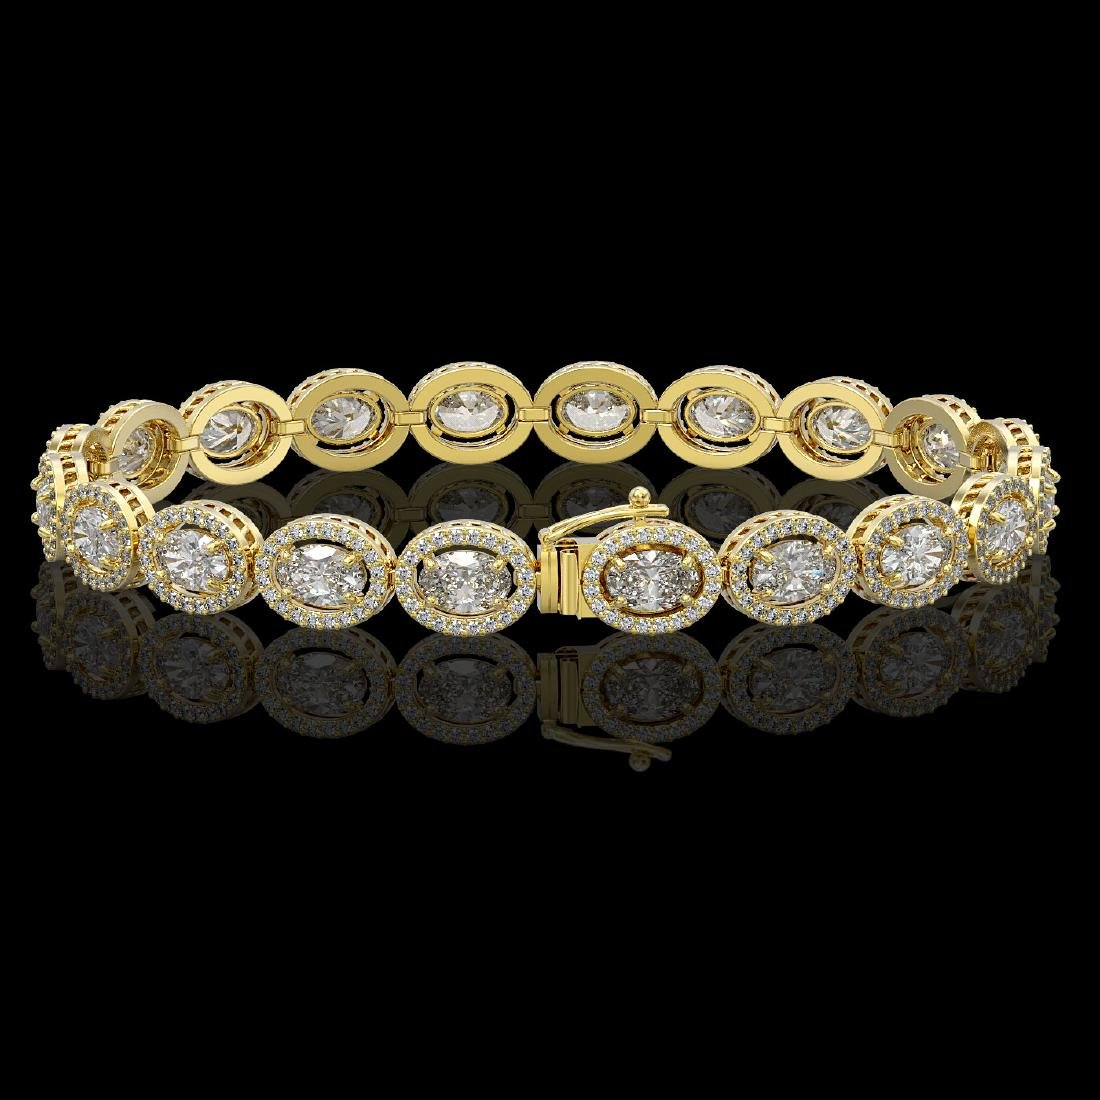 13.25 CTW Oval Diamond Designer Bracelet 18K Yellow - 2